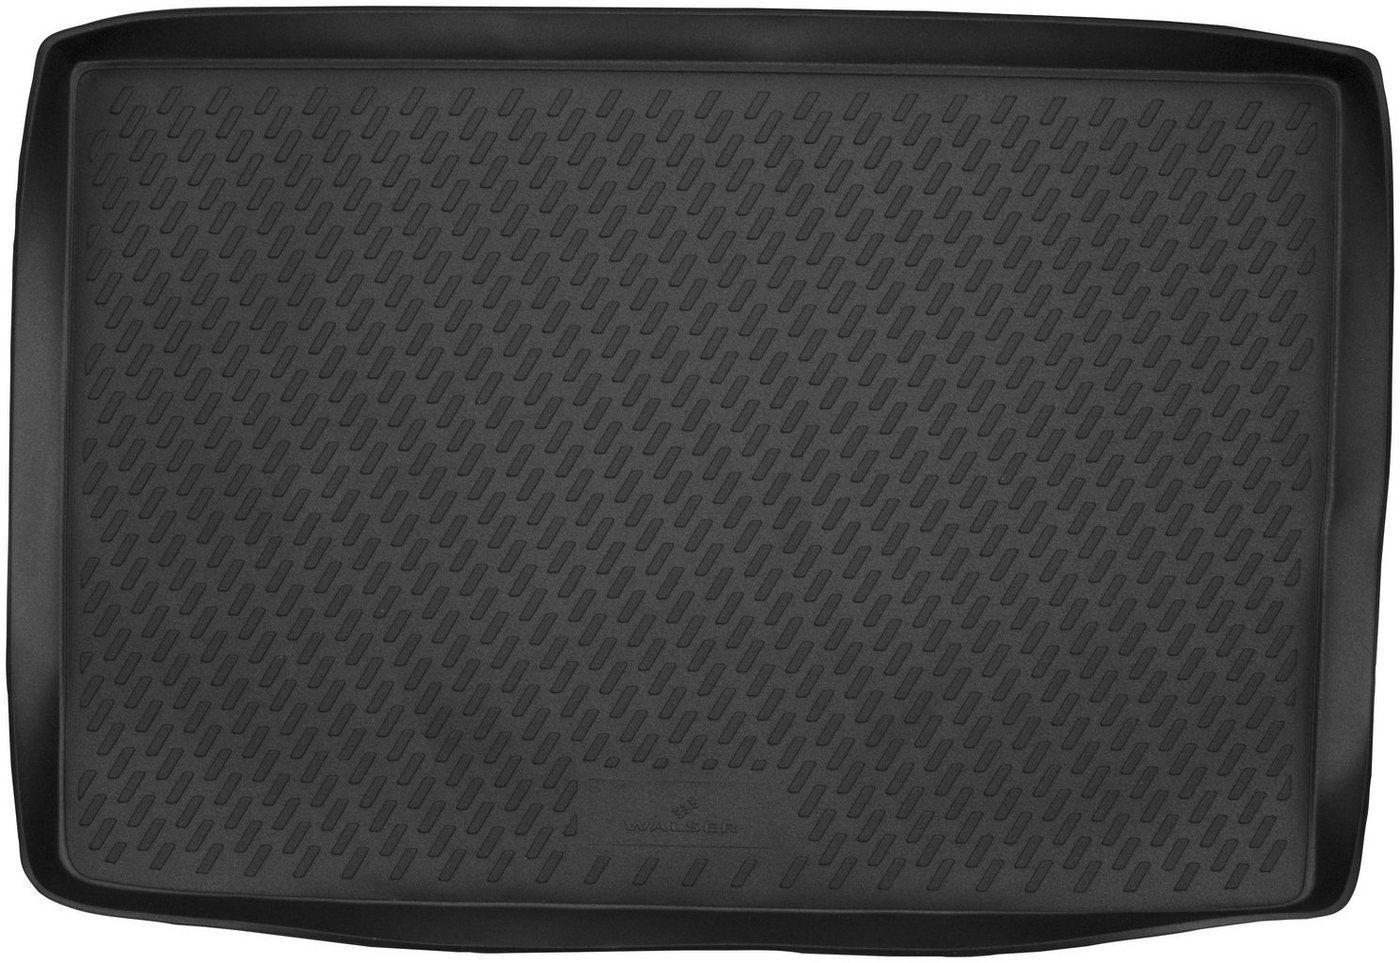 WALSER Kofferraumwanne »XTR« (1 Stück), Opel Meriva Großr.lim., für Opel Meriva B BJ 2010 - 2017